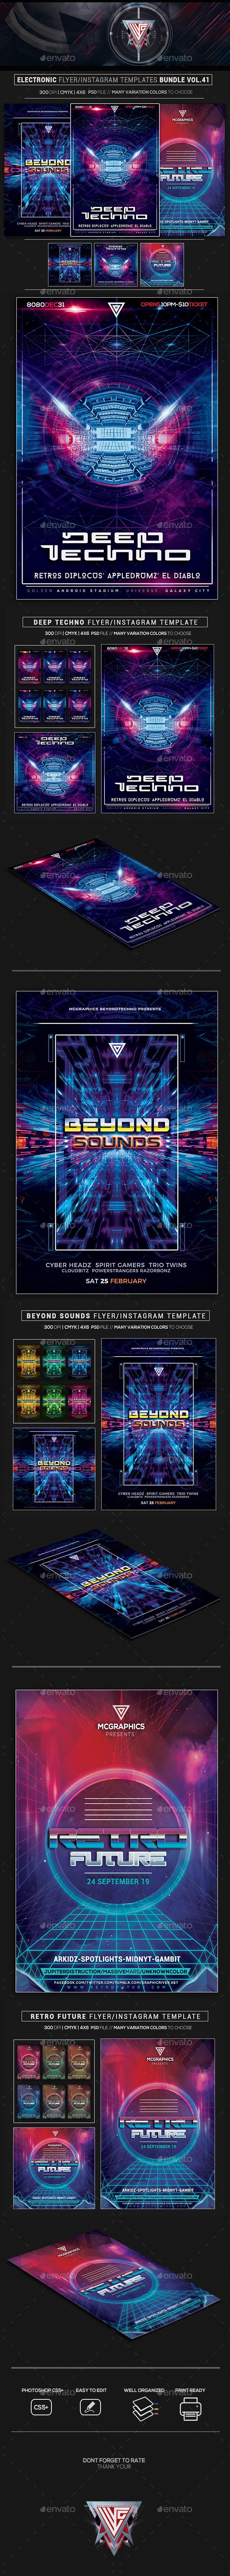 Electro Music Flyer/Instagram Bundle Vol. 41 - Flyers Print Templates